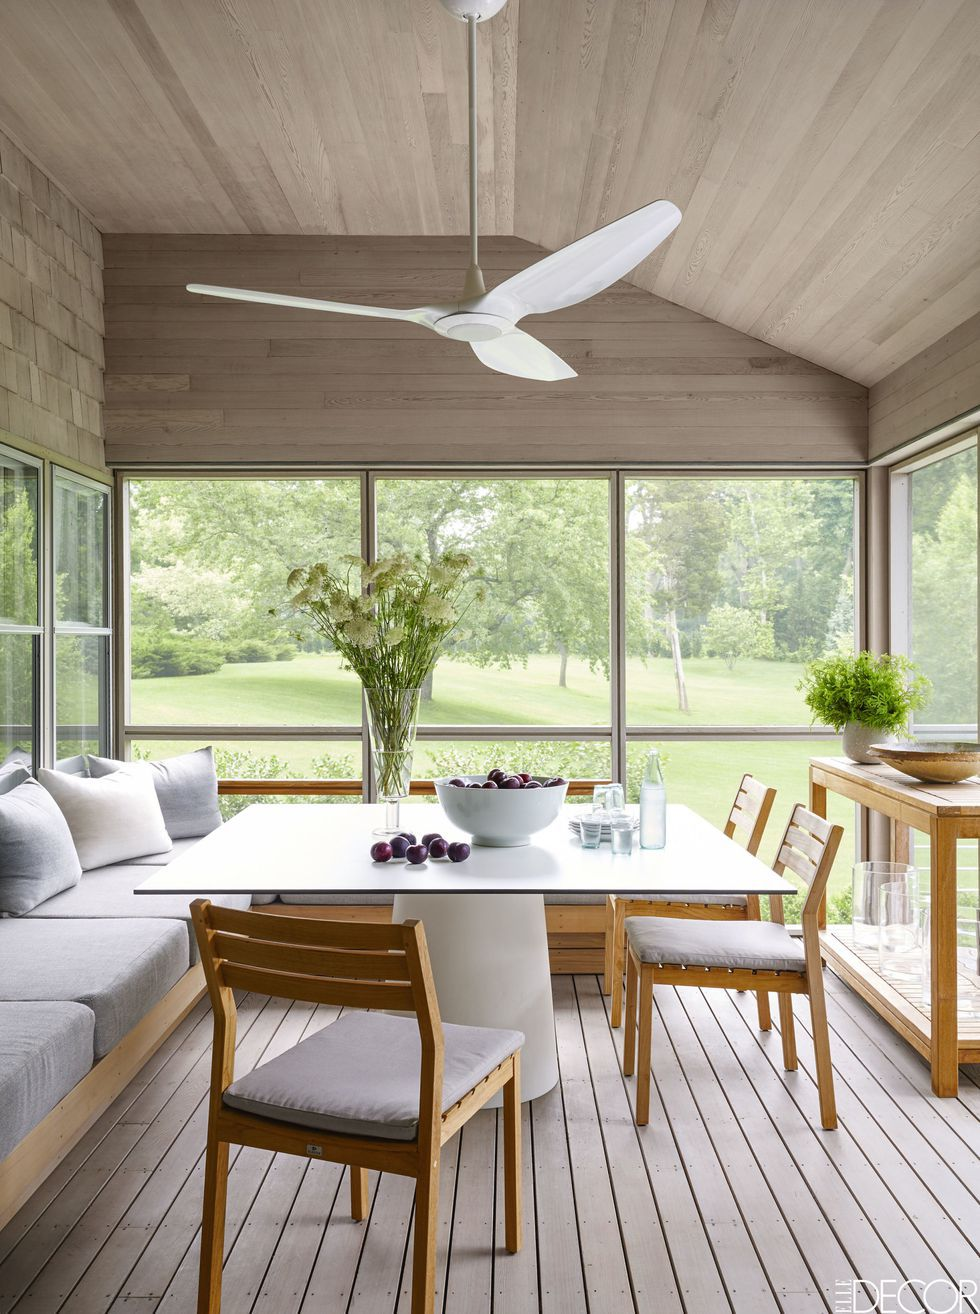 20 gorgeous beach house decor ideas - easy coastal design ideas CFCQTYI